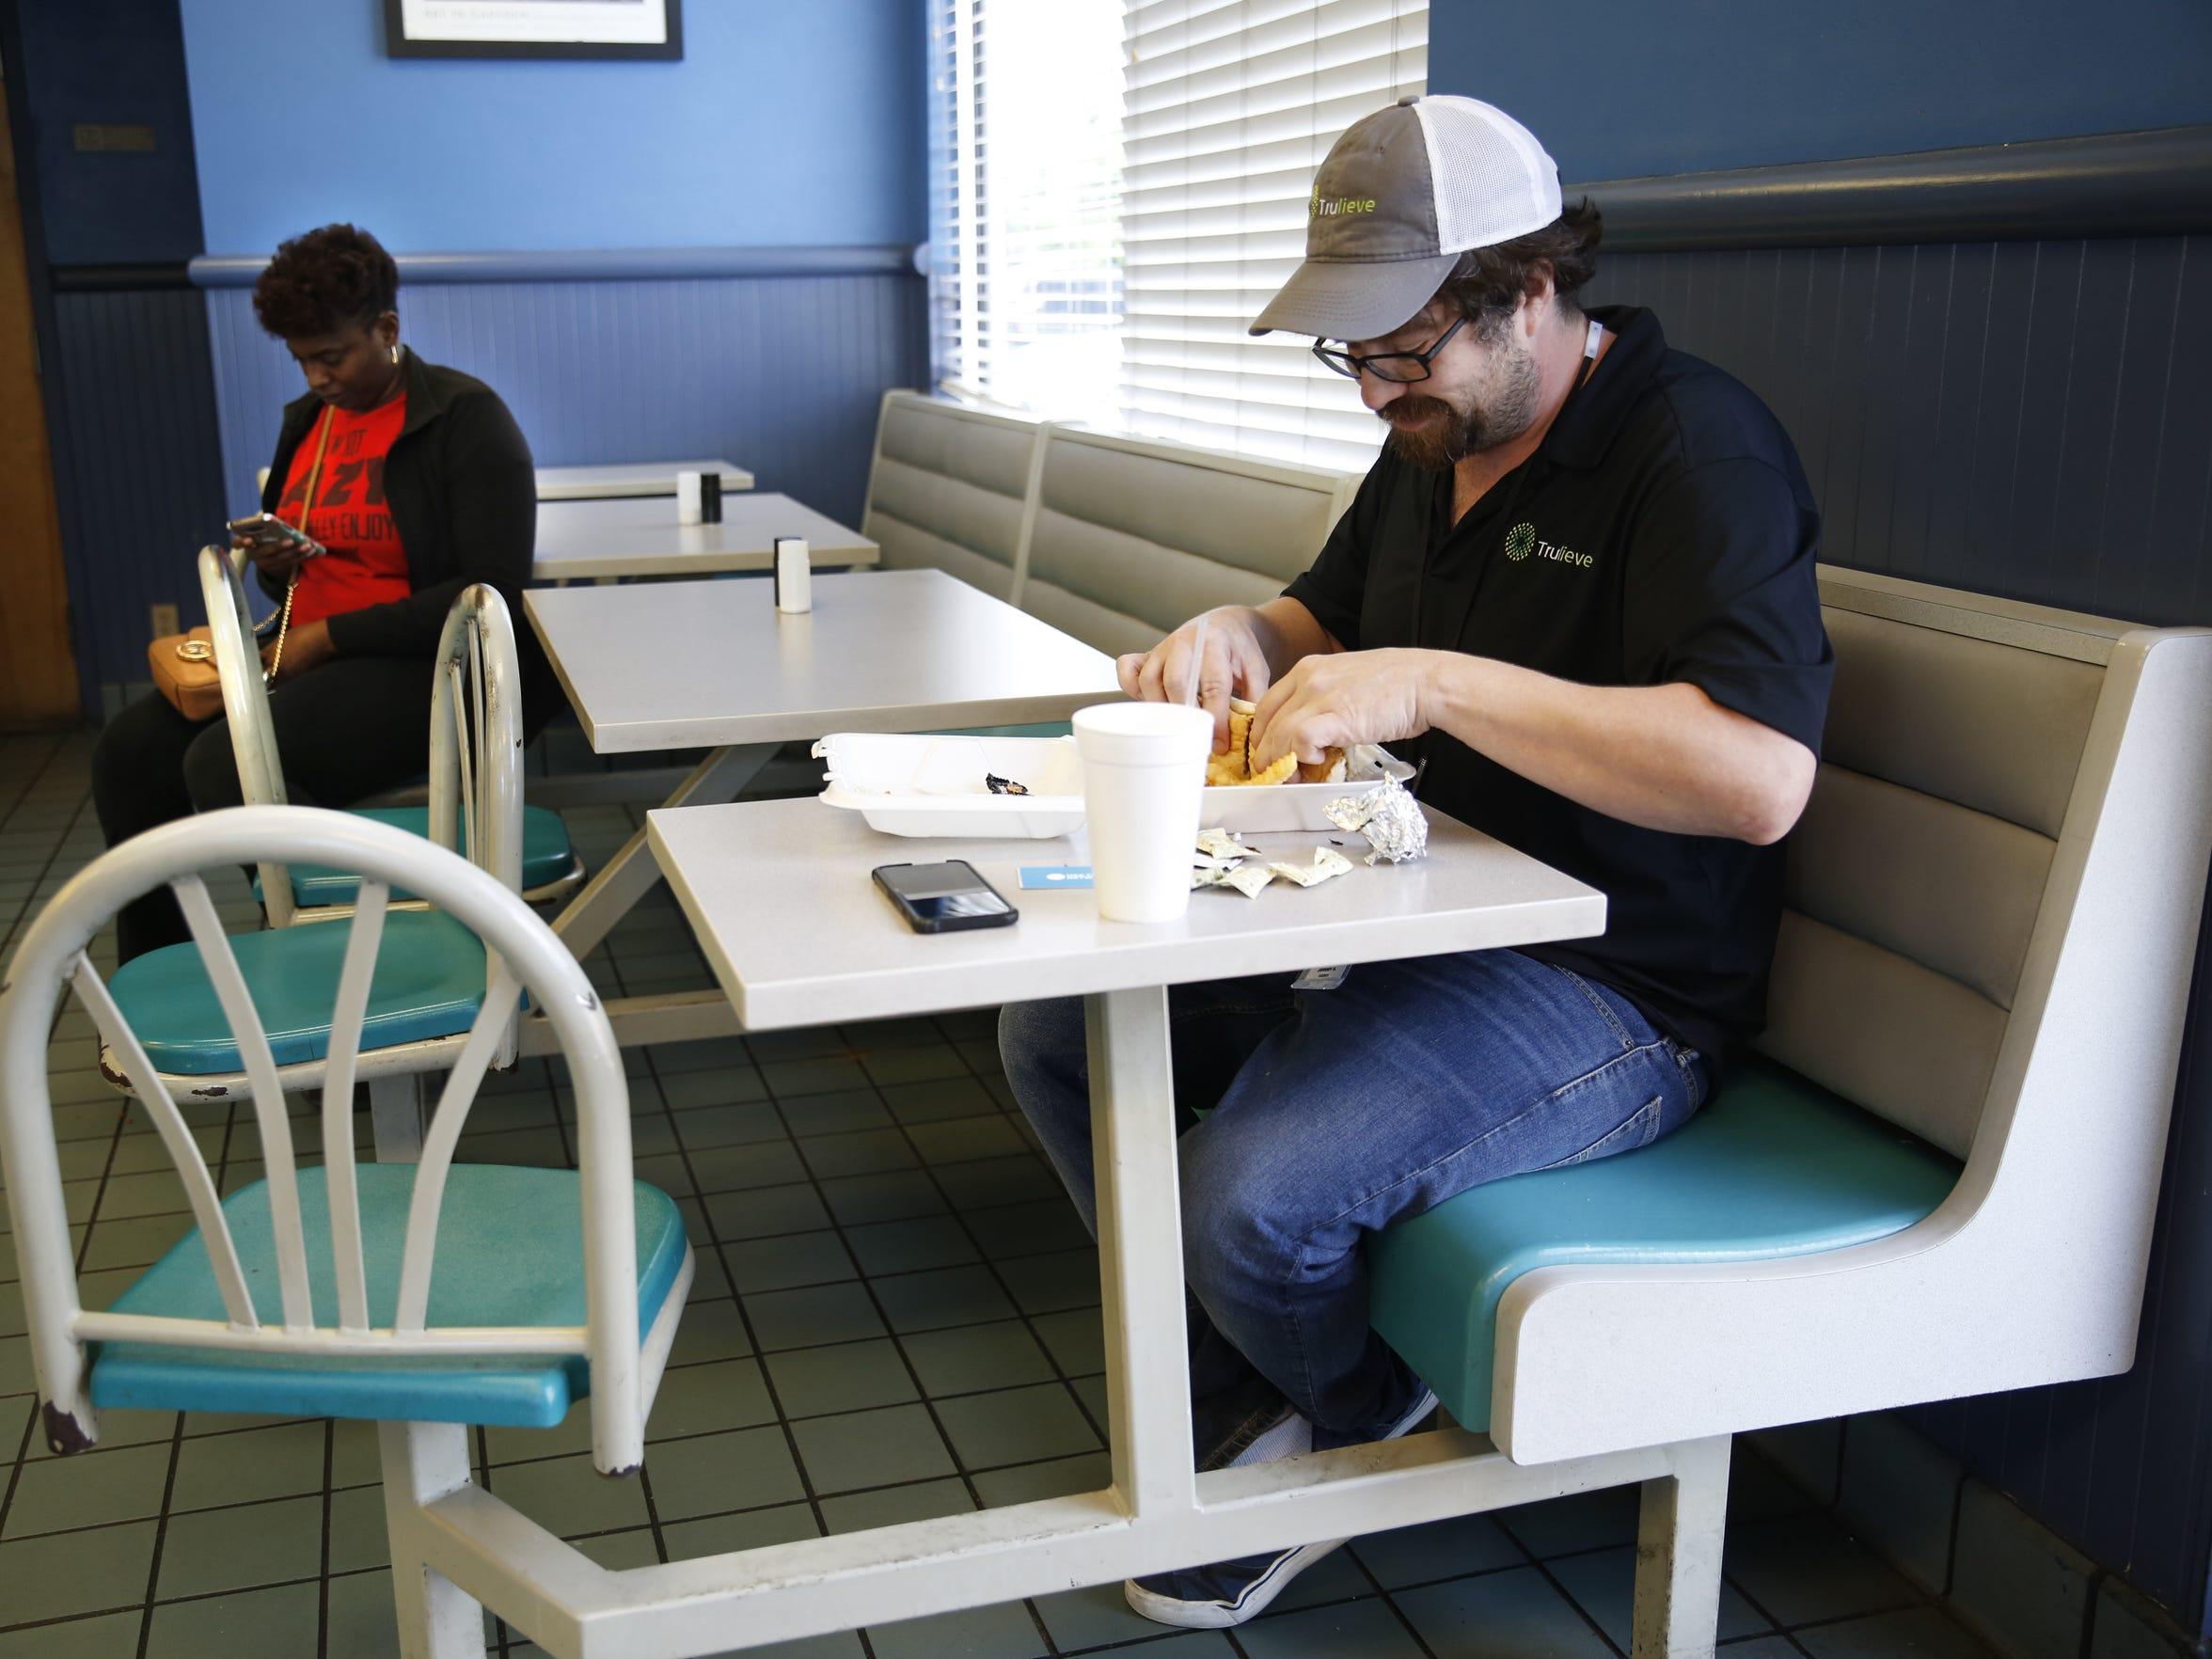 Trulieve employee Jeremy Sullivan eats lunch at AJ's